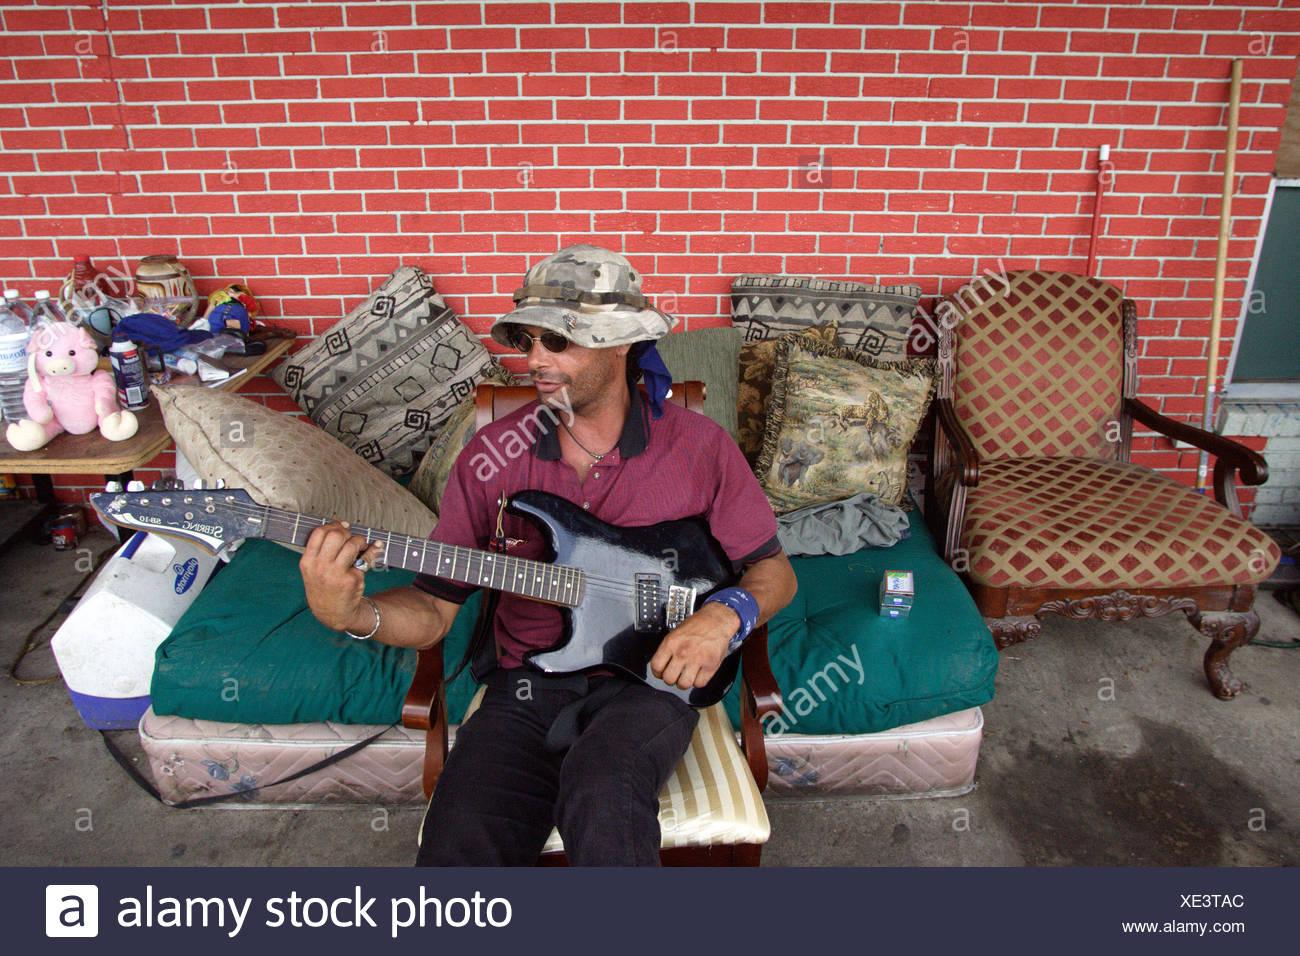 Man playing his electric guitar, after Hurricane Katrina - Stock Image